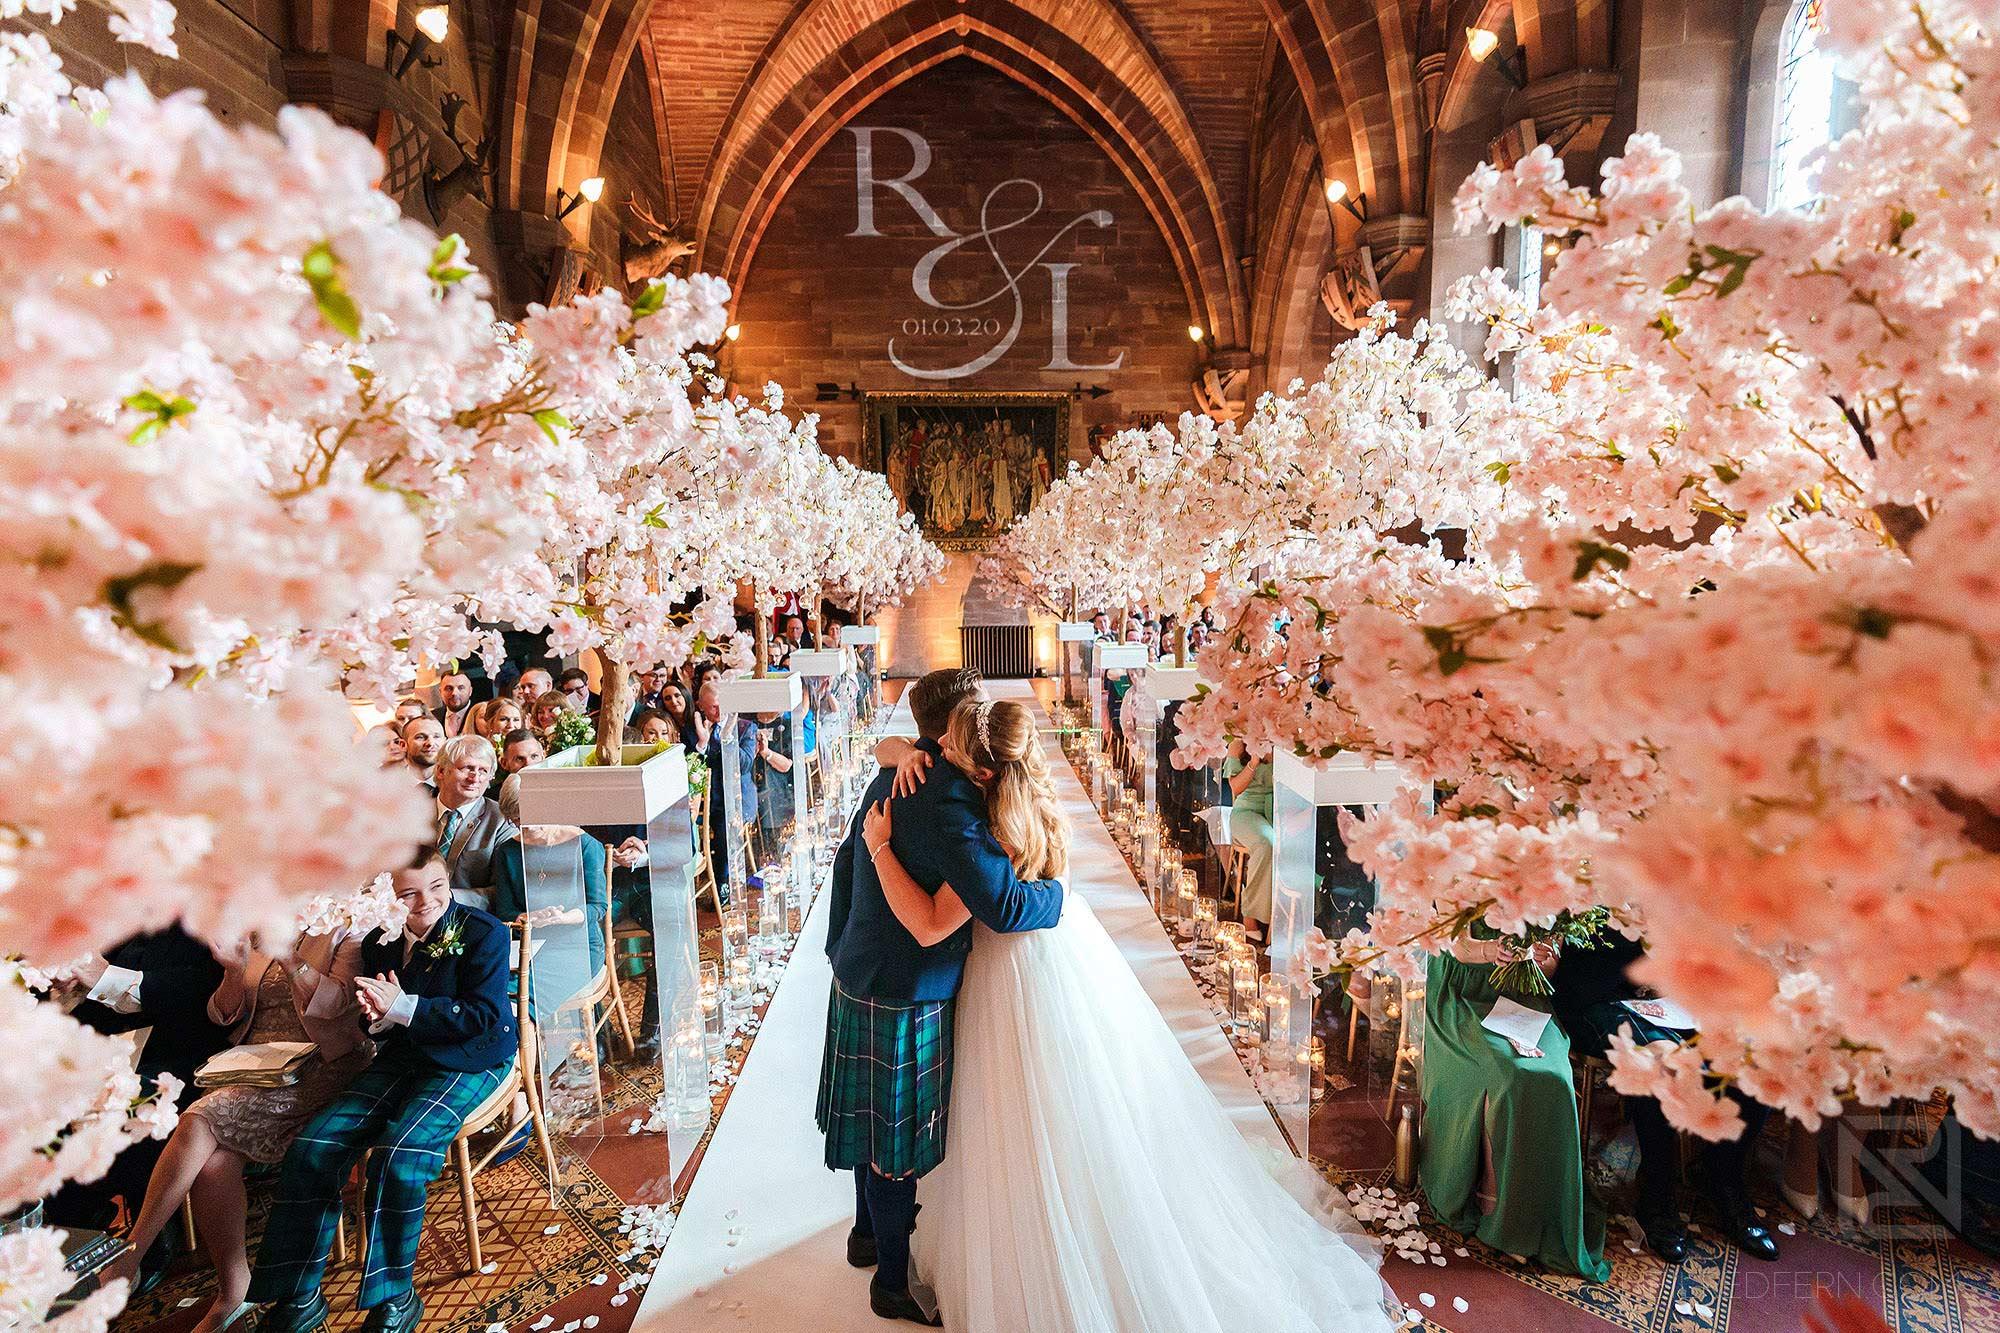 First kiss at Peckforton Castle wedding